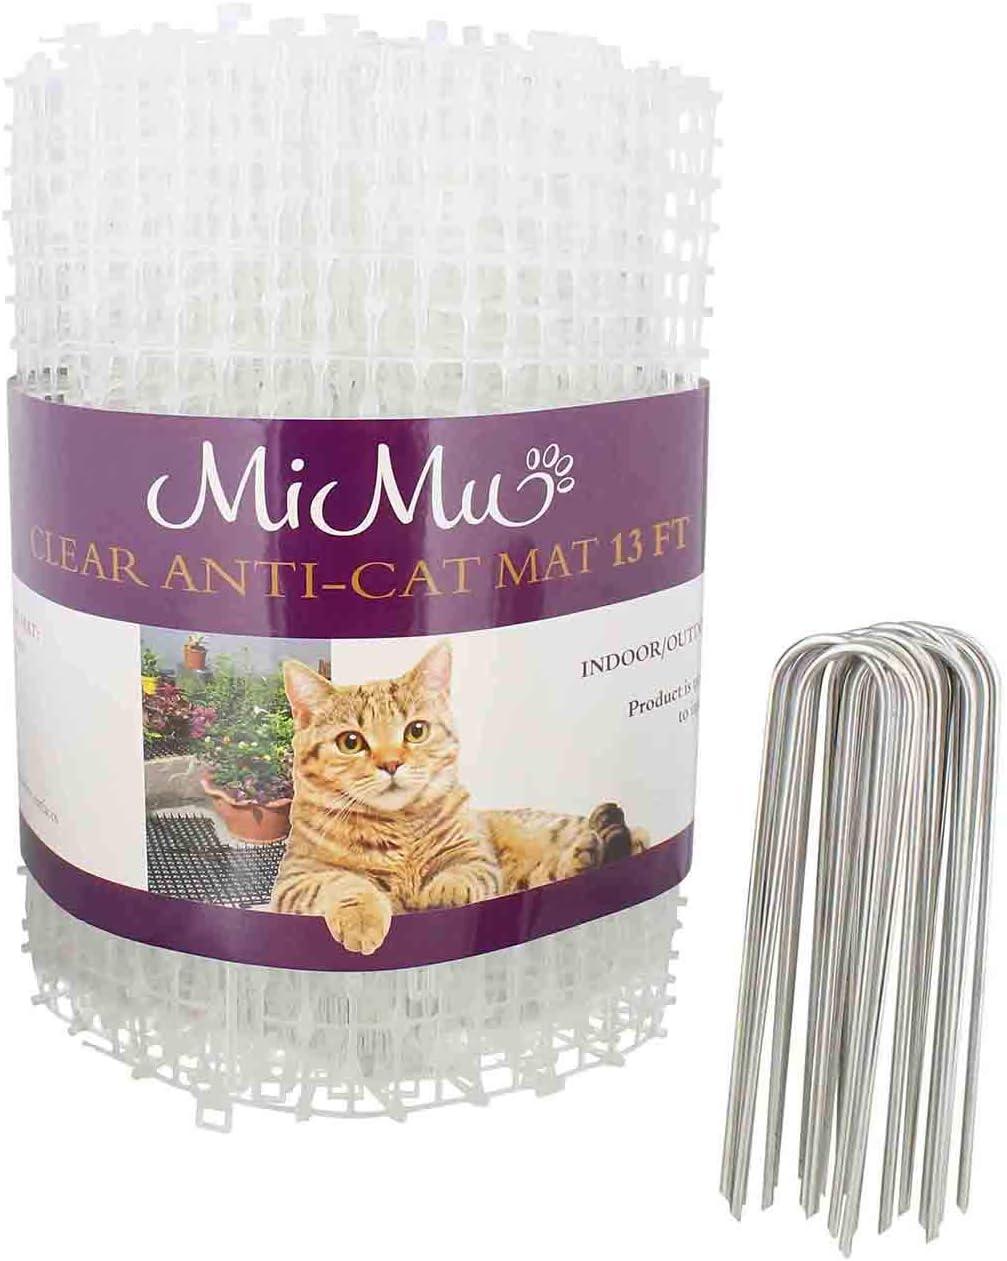 MiMu Dog & Cat Deterrent Mat Outdoor & Indoor Cat Scat Spike Mat Cat Repellent Spikes - Continuous Roll in Clear